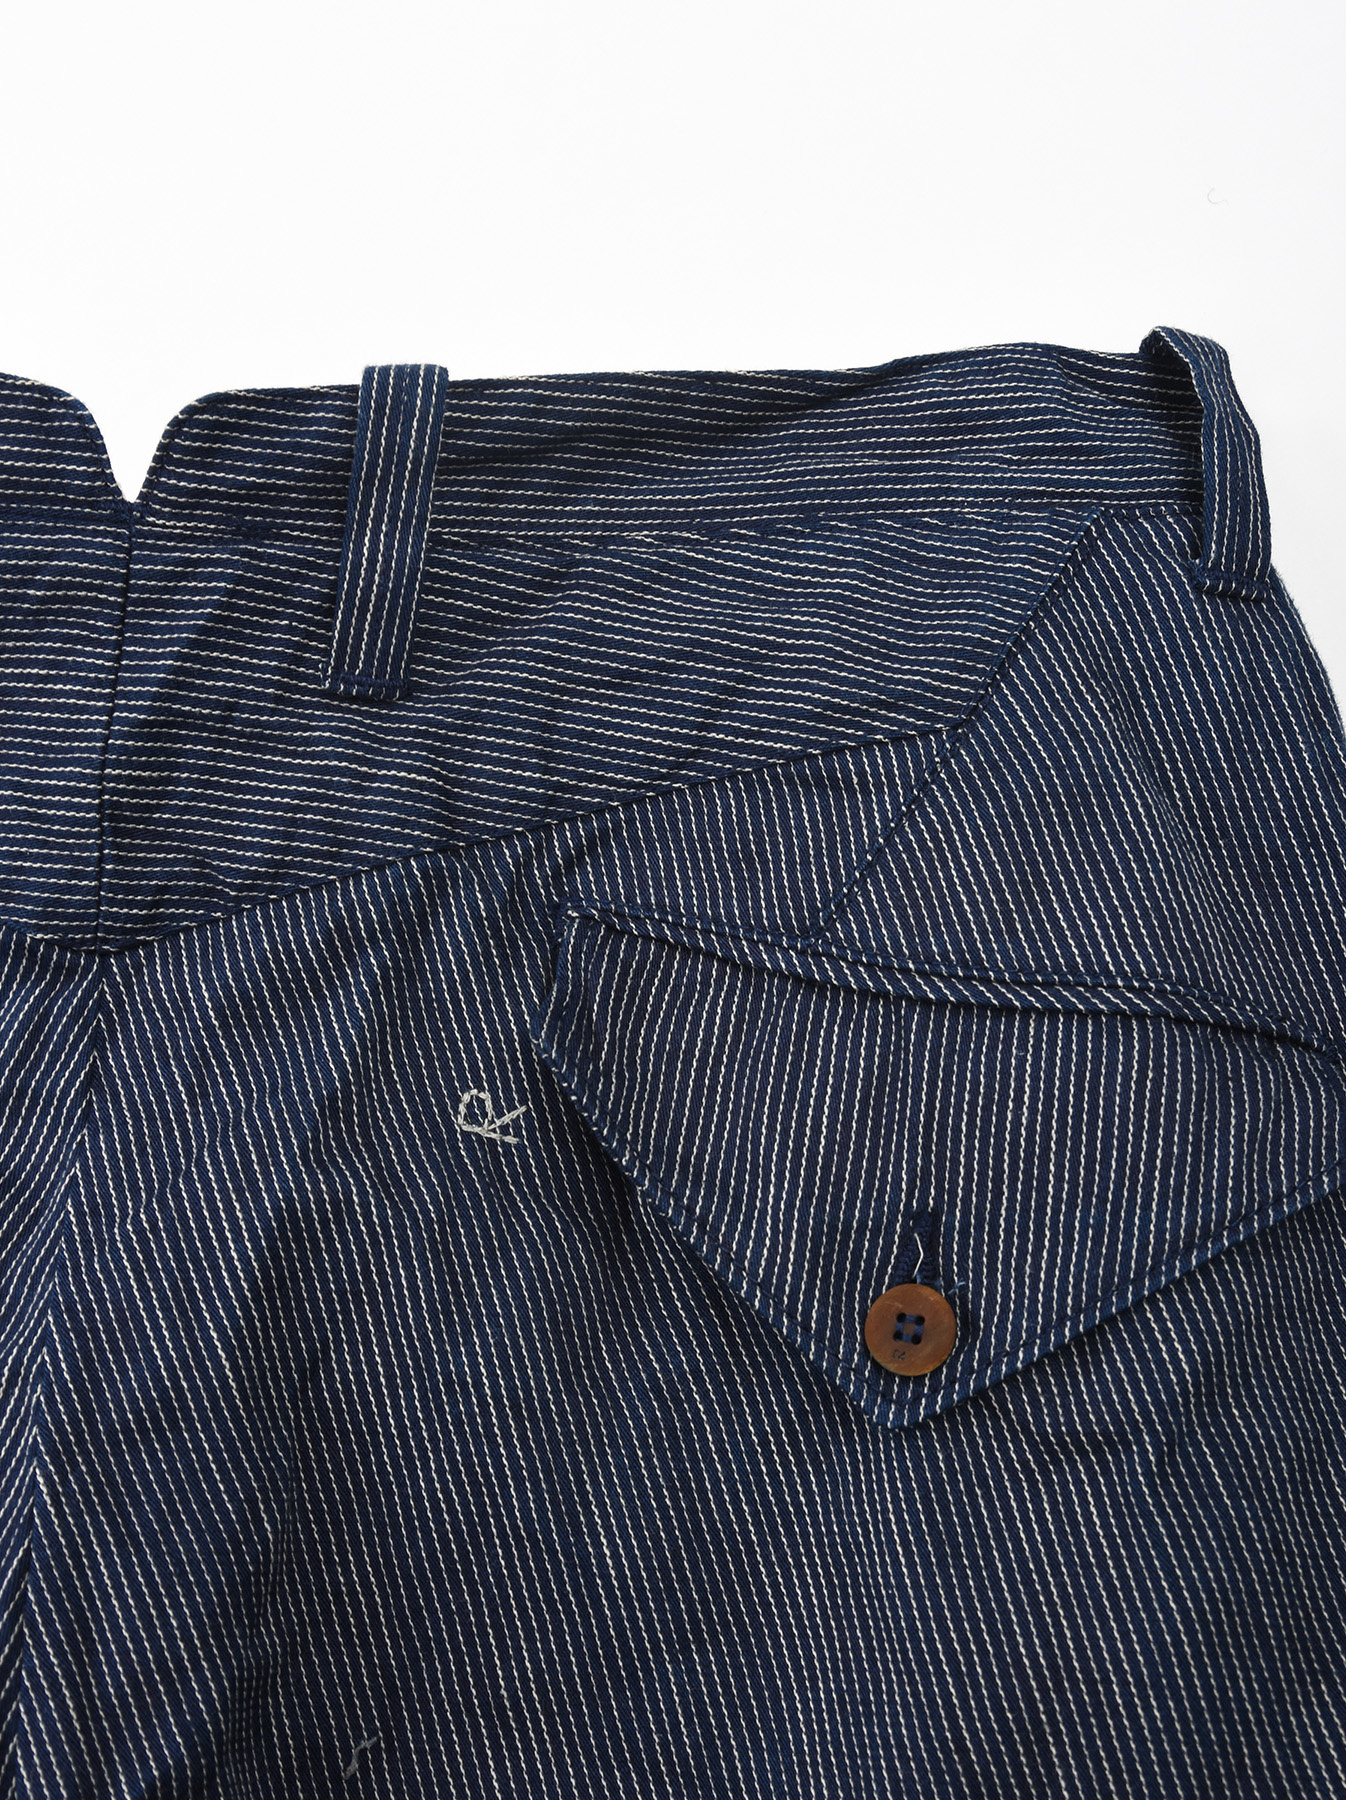 WH Indigo Mugi Yoko-shusi Work Pants-11